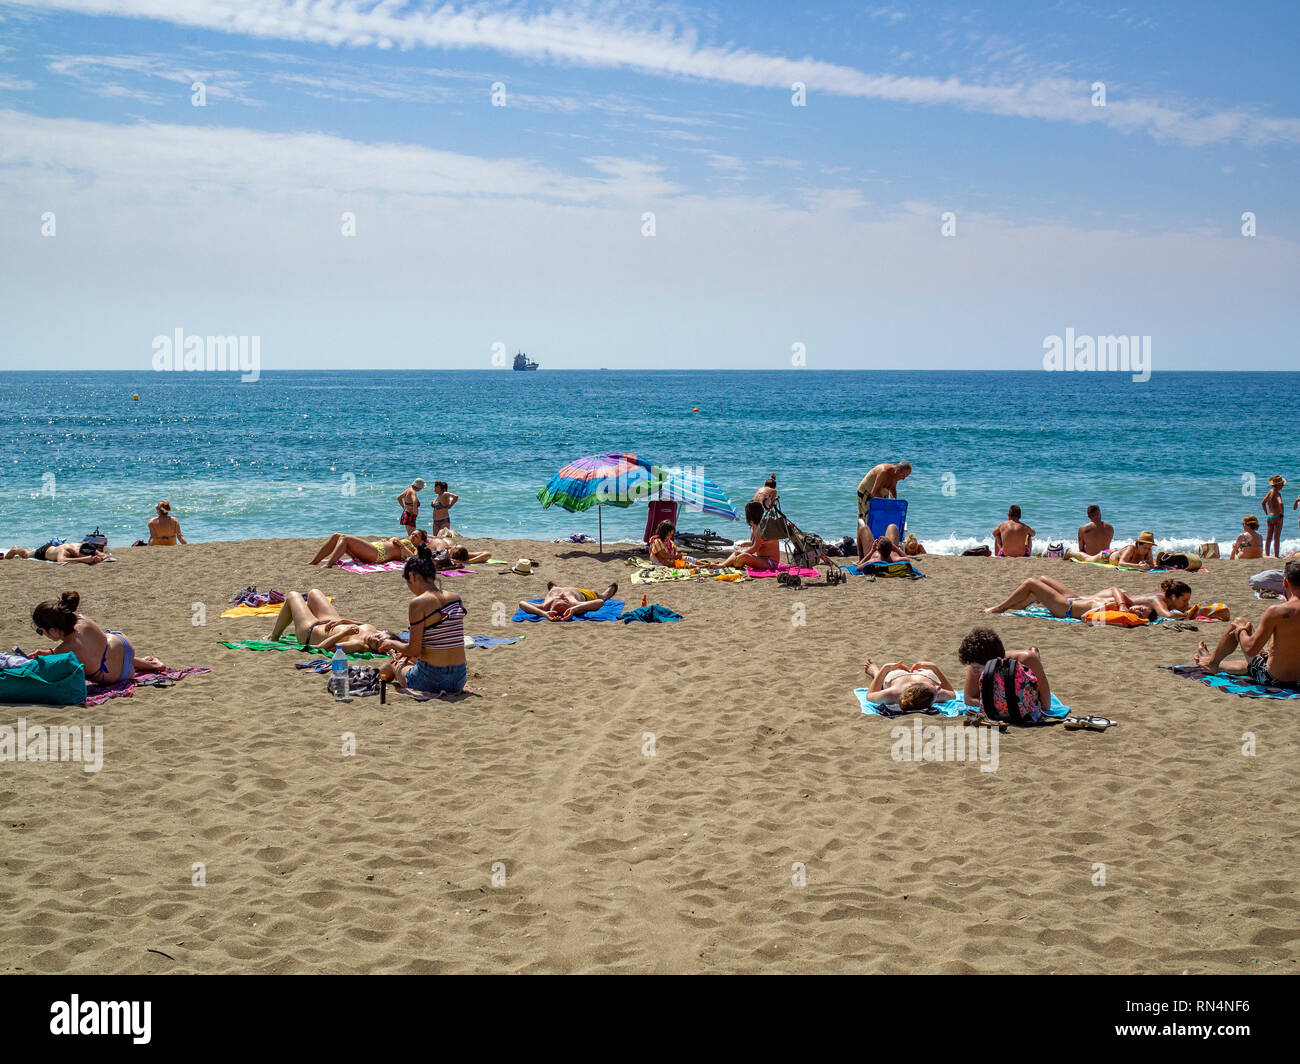 People sun baking at Playa de la Malagueta beach in Malaga, Spain. Stock Photo